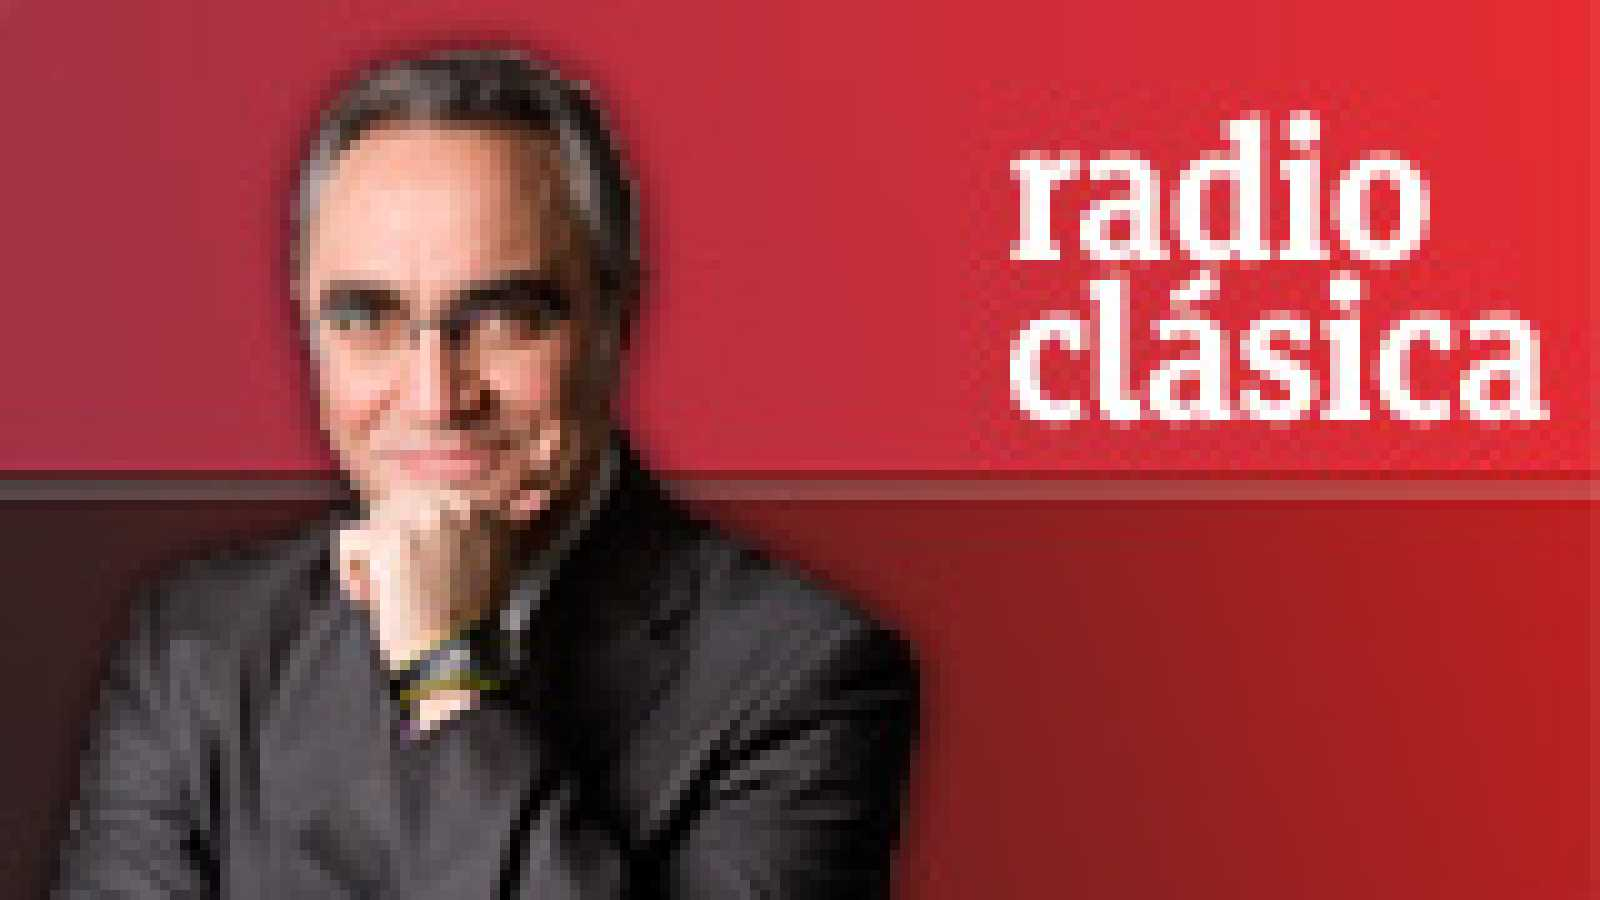 Album de discos - Enric Morera - 09/06/12 - Escuchar ahora